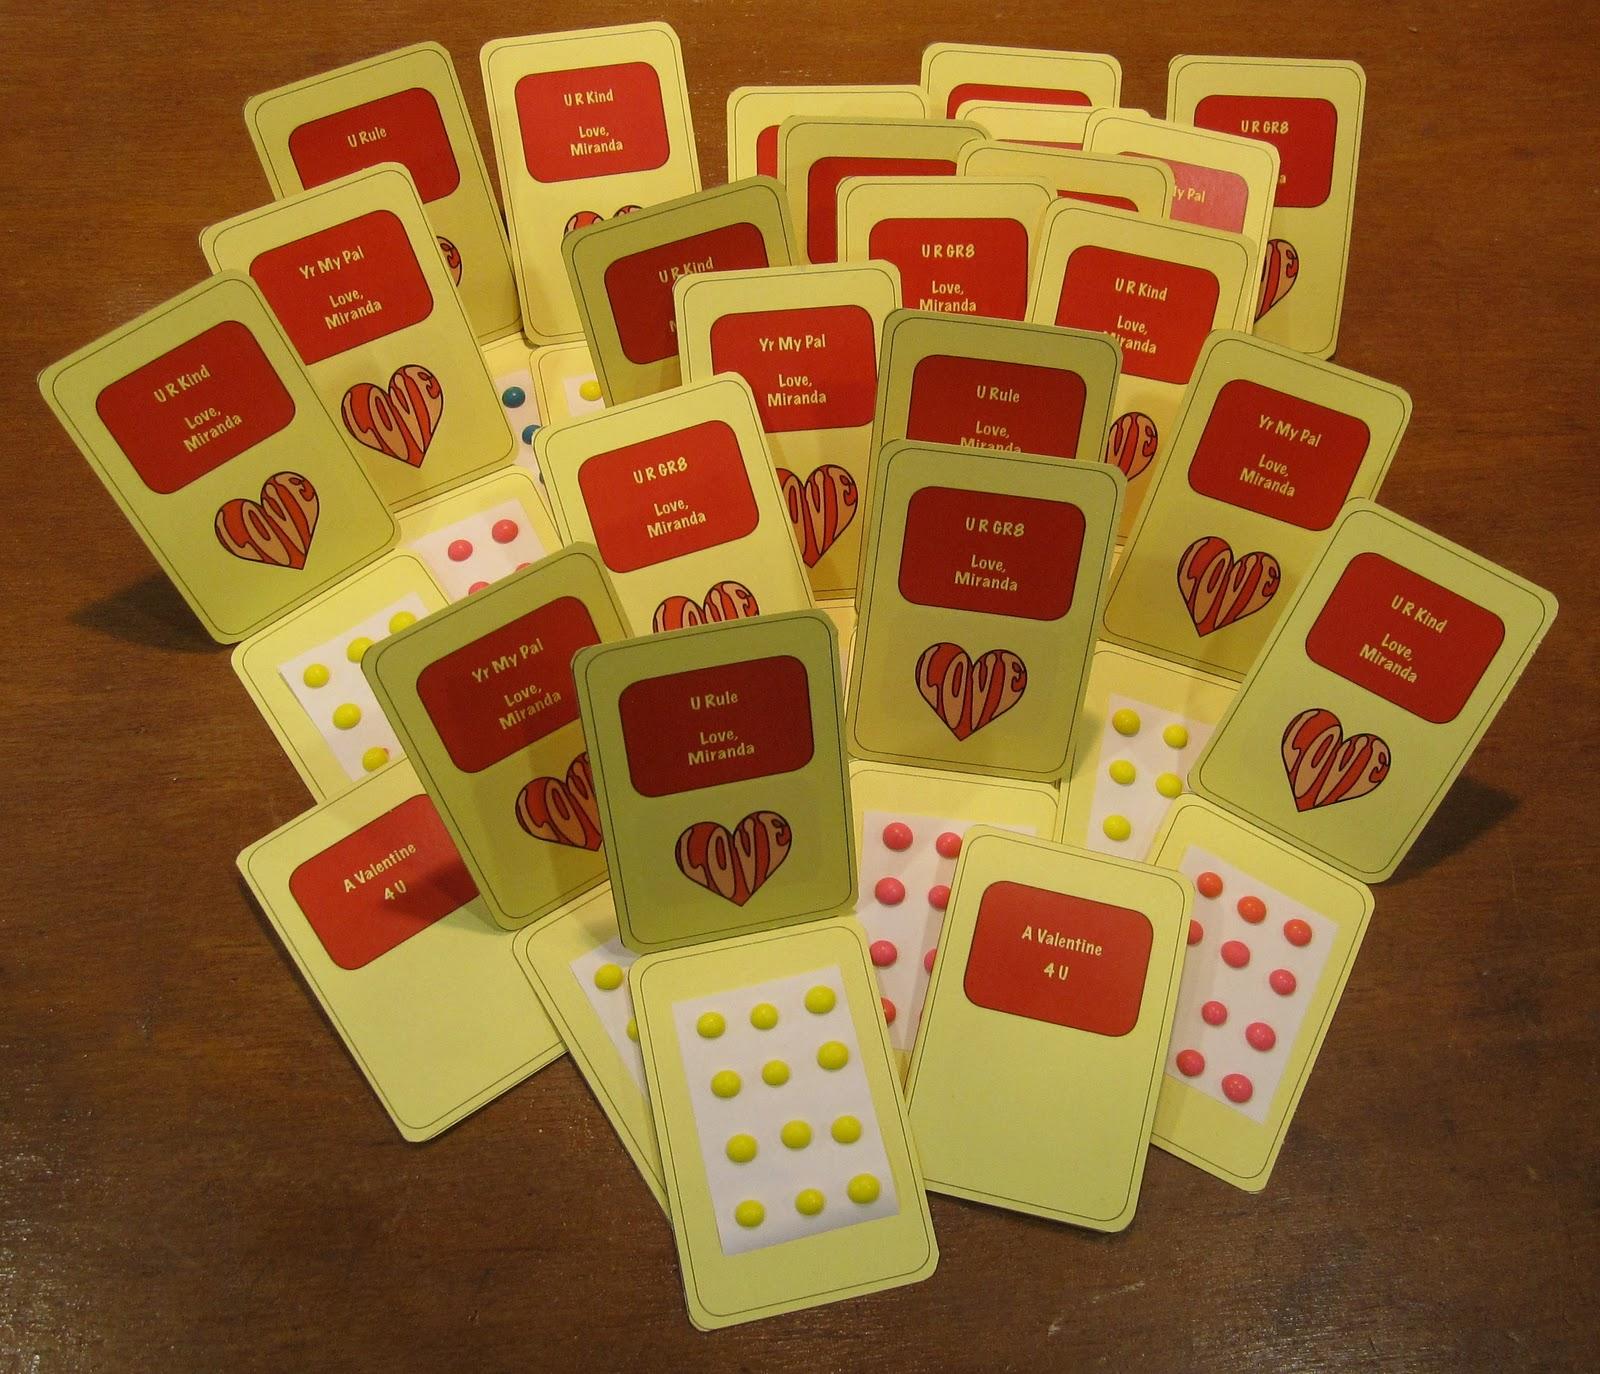 http://3.bp.blogspot.com/_6MKBhuBDOSk/TU8SP65wn9I/AAAAAAAADoA/KNn0rzXye3k/s1600/Valentine%2BCellPhone.jpg